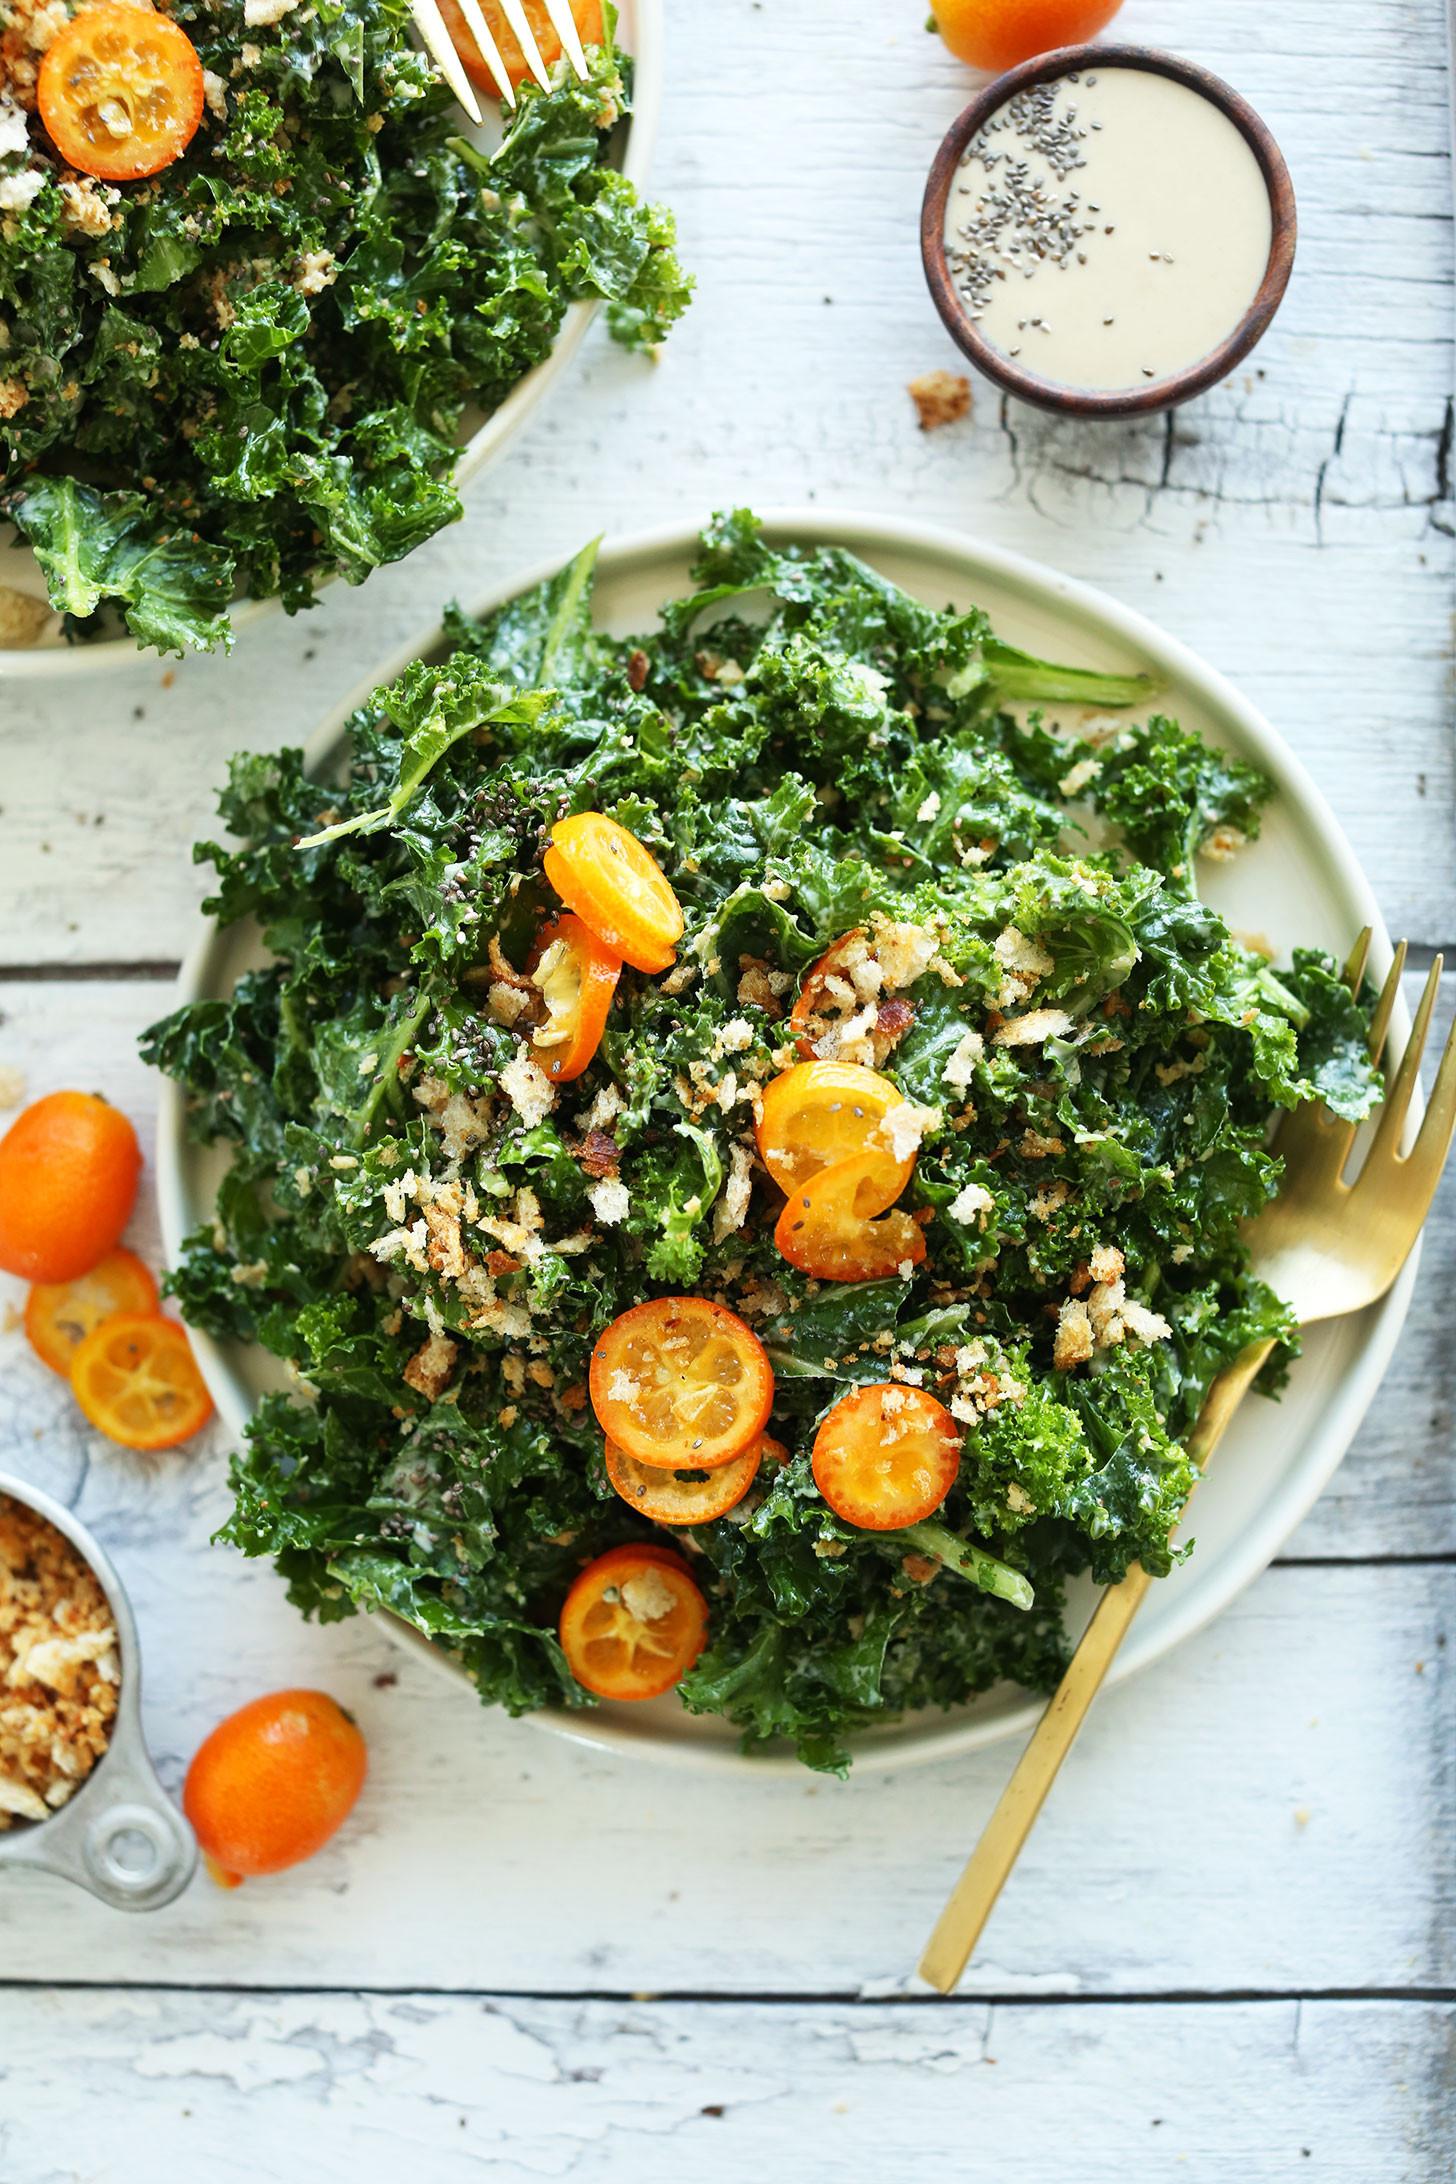 Healthy Kale Salad Recipes  Kumquat Kale Salad